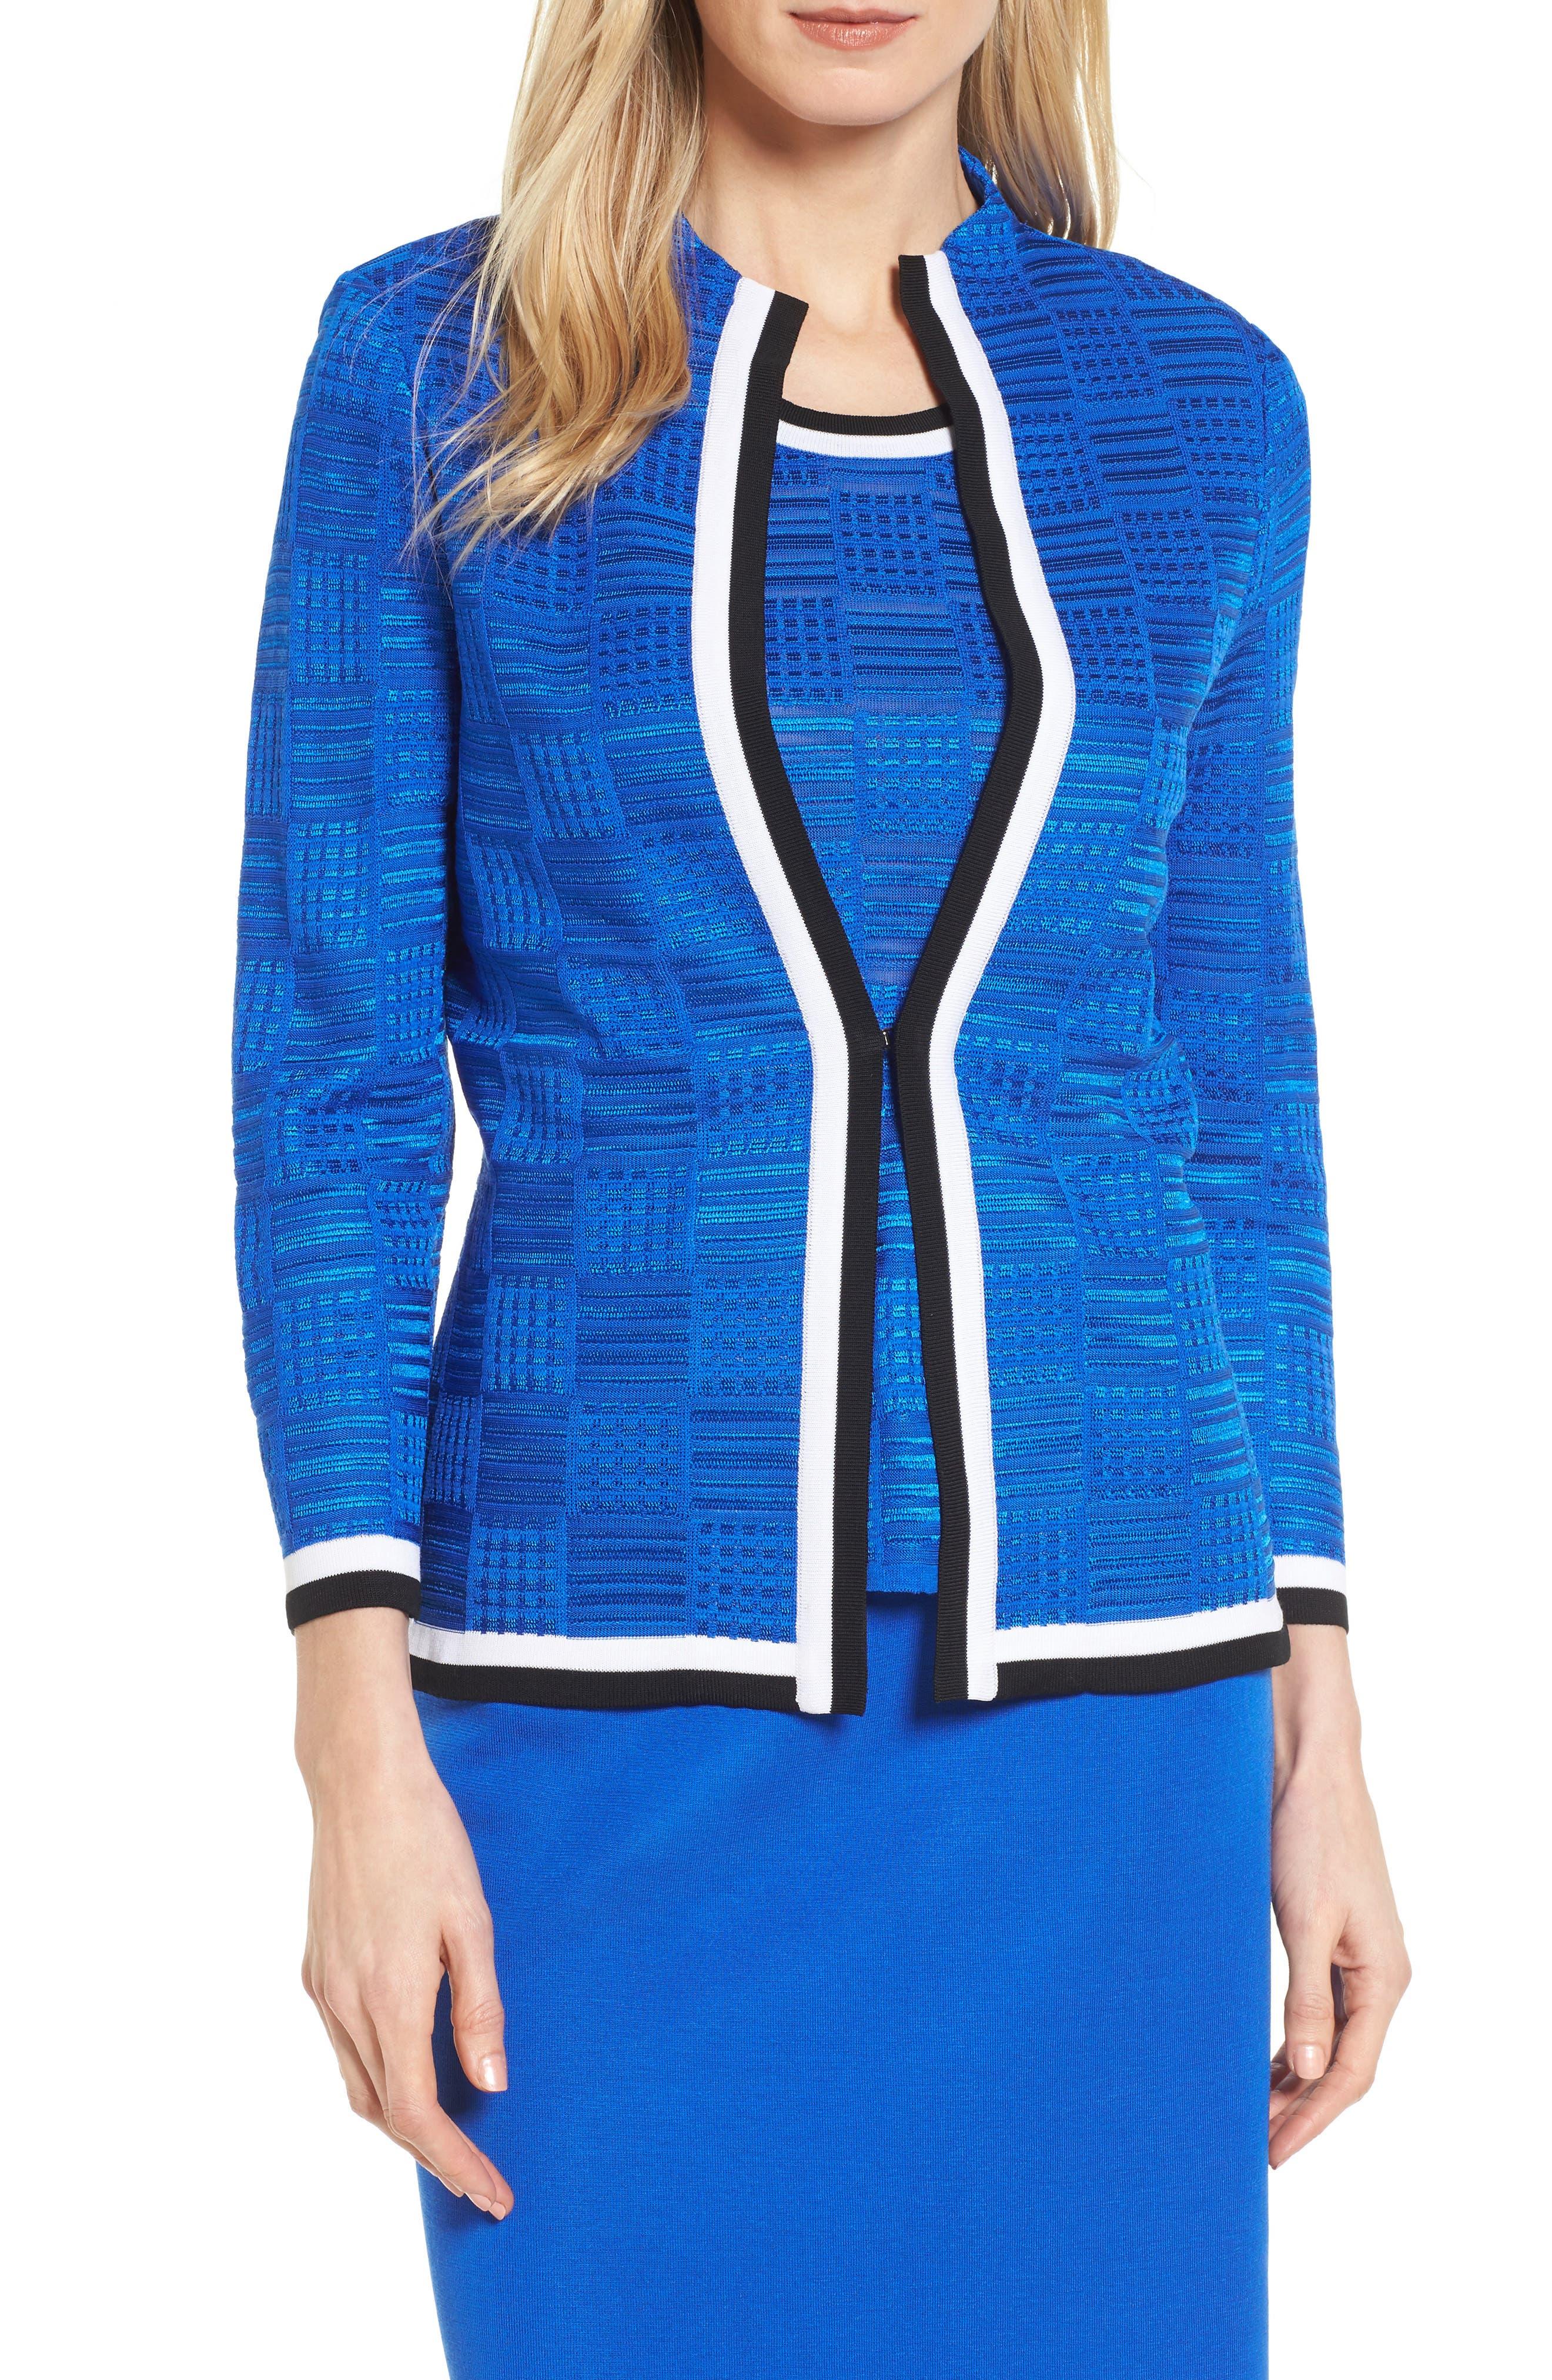 Basketweave Jacquard Jacket,                         Main,                         color, Patriot Blue/ Black/ White